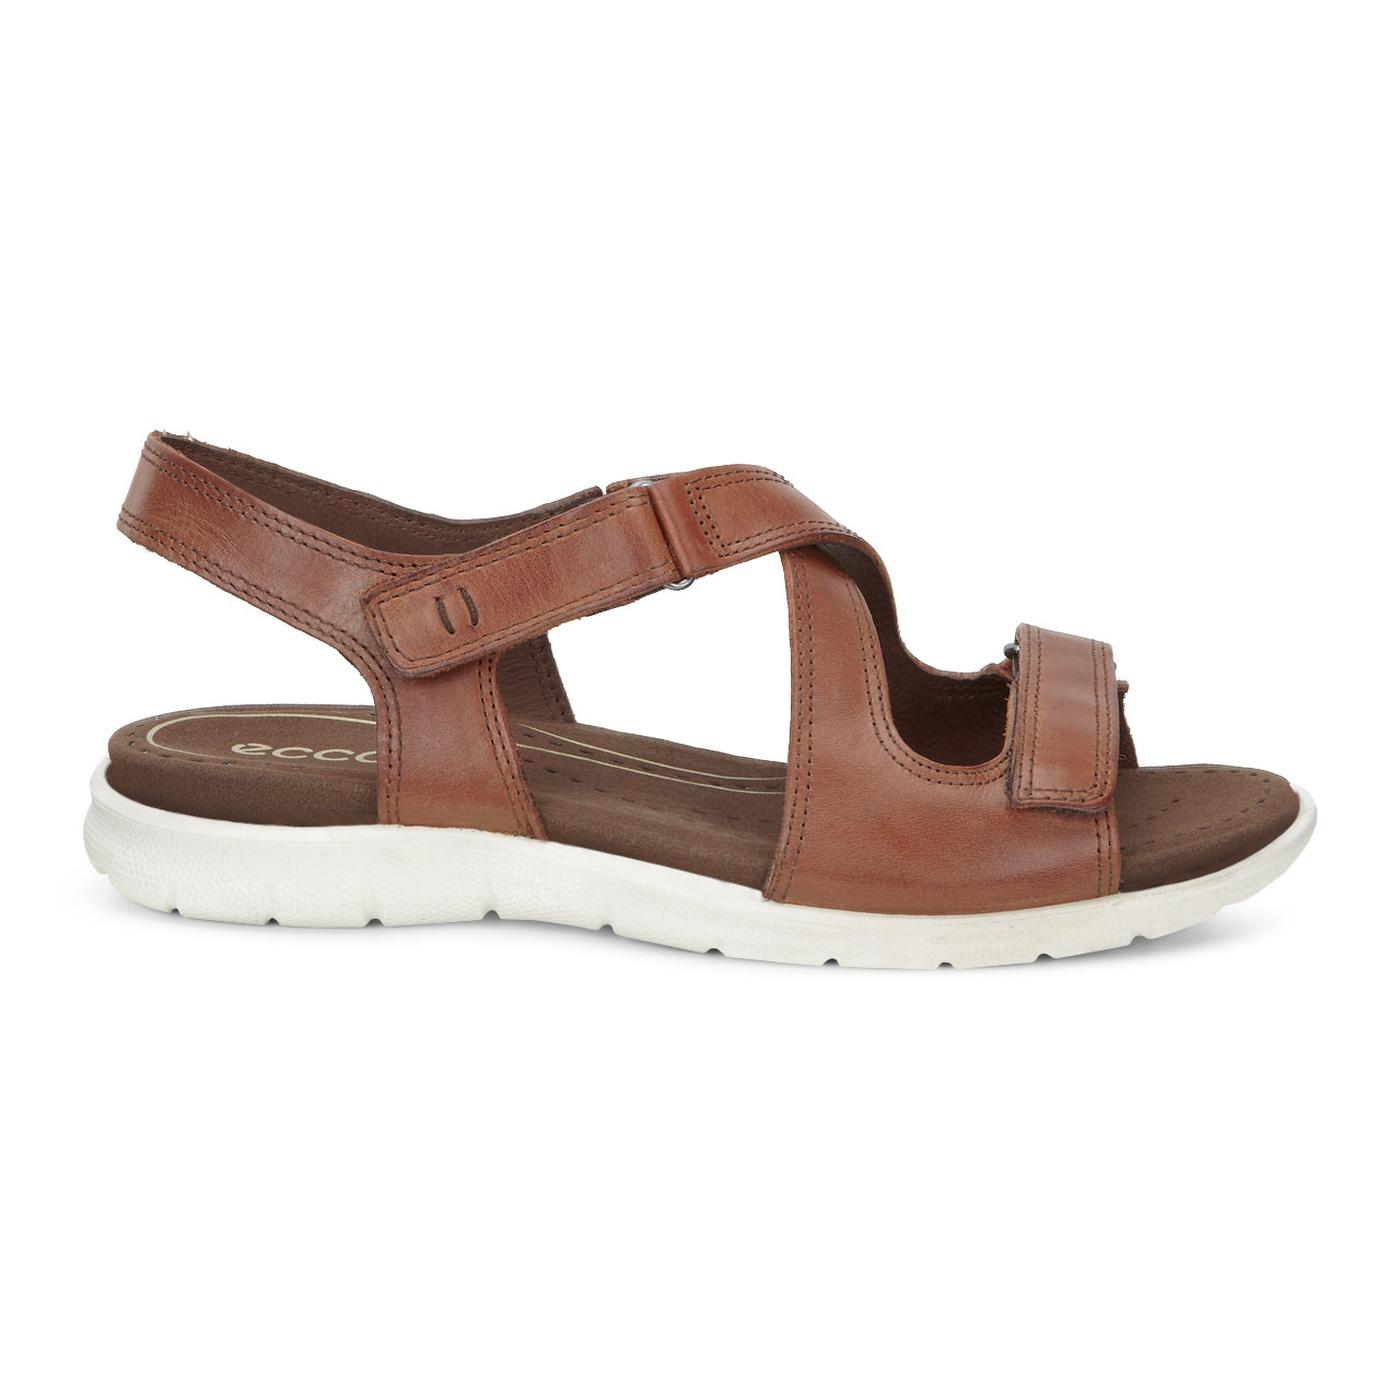 Ecco Babett Sandal Women S Sandals Ecco 174 Shoes